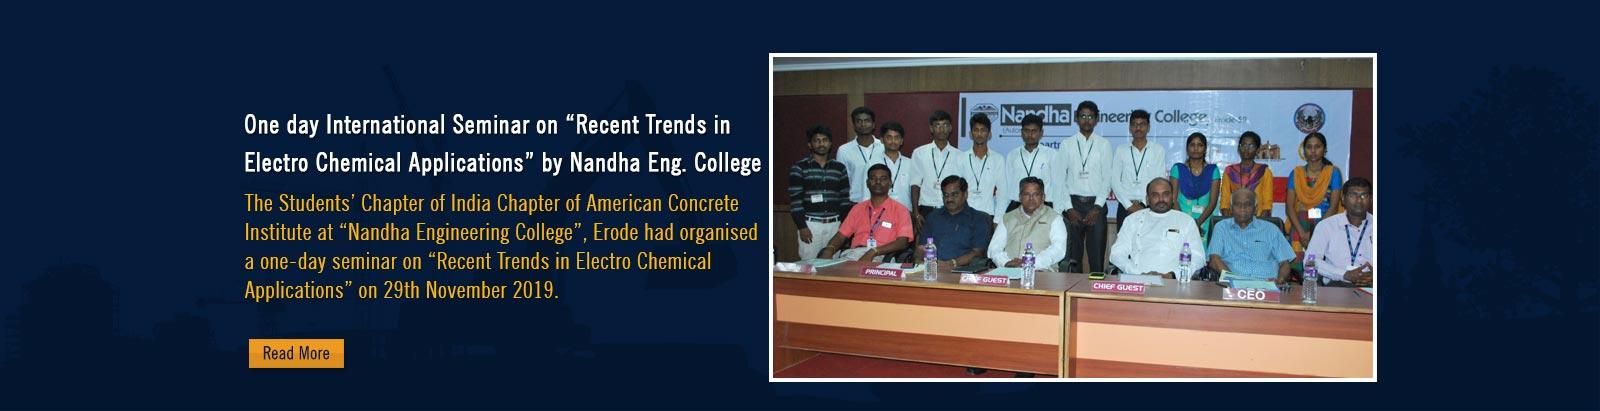 Nandha-Engineering-College-Banner